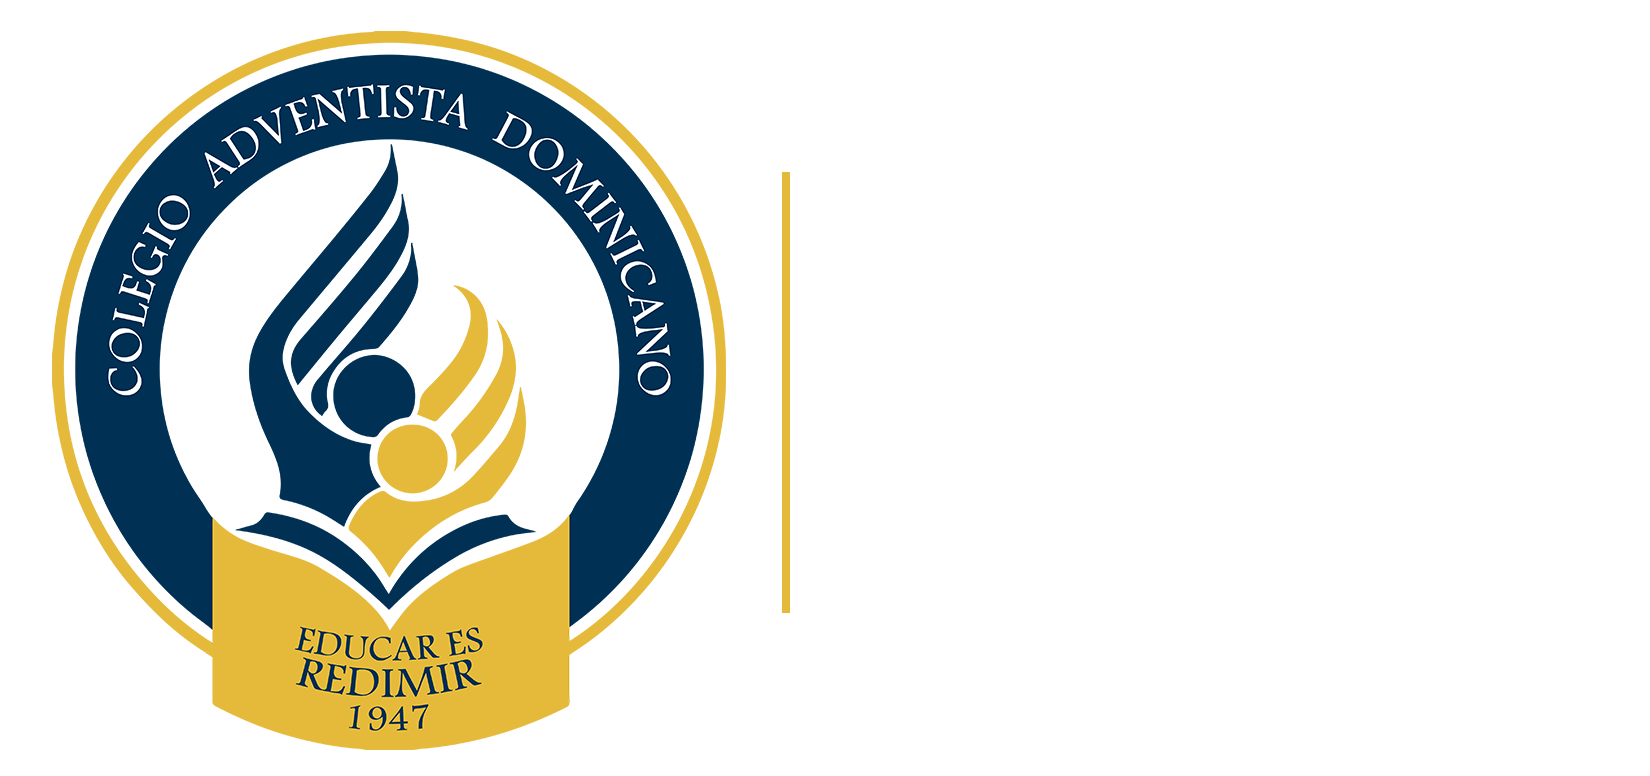 logo colegio adventista dominicano